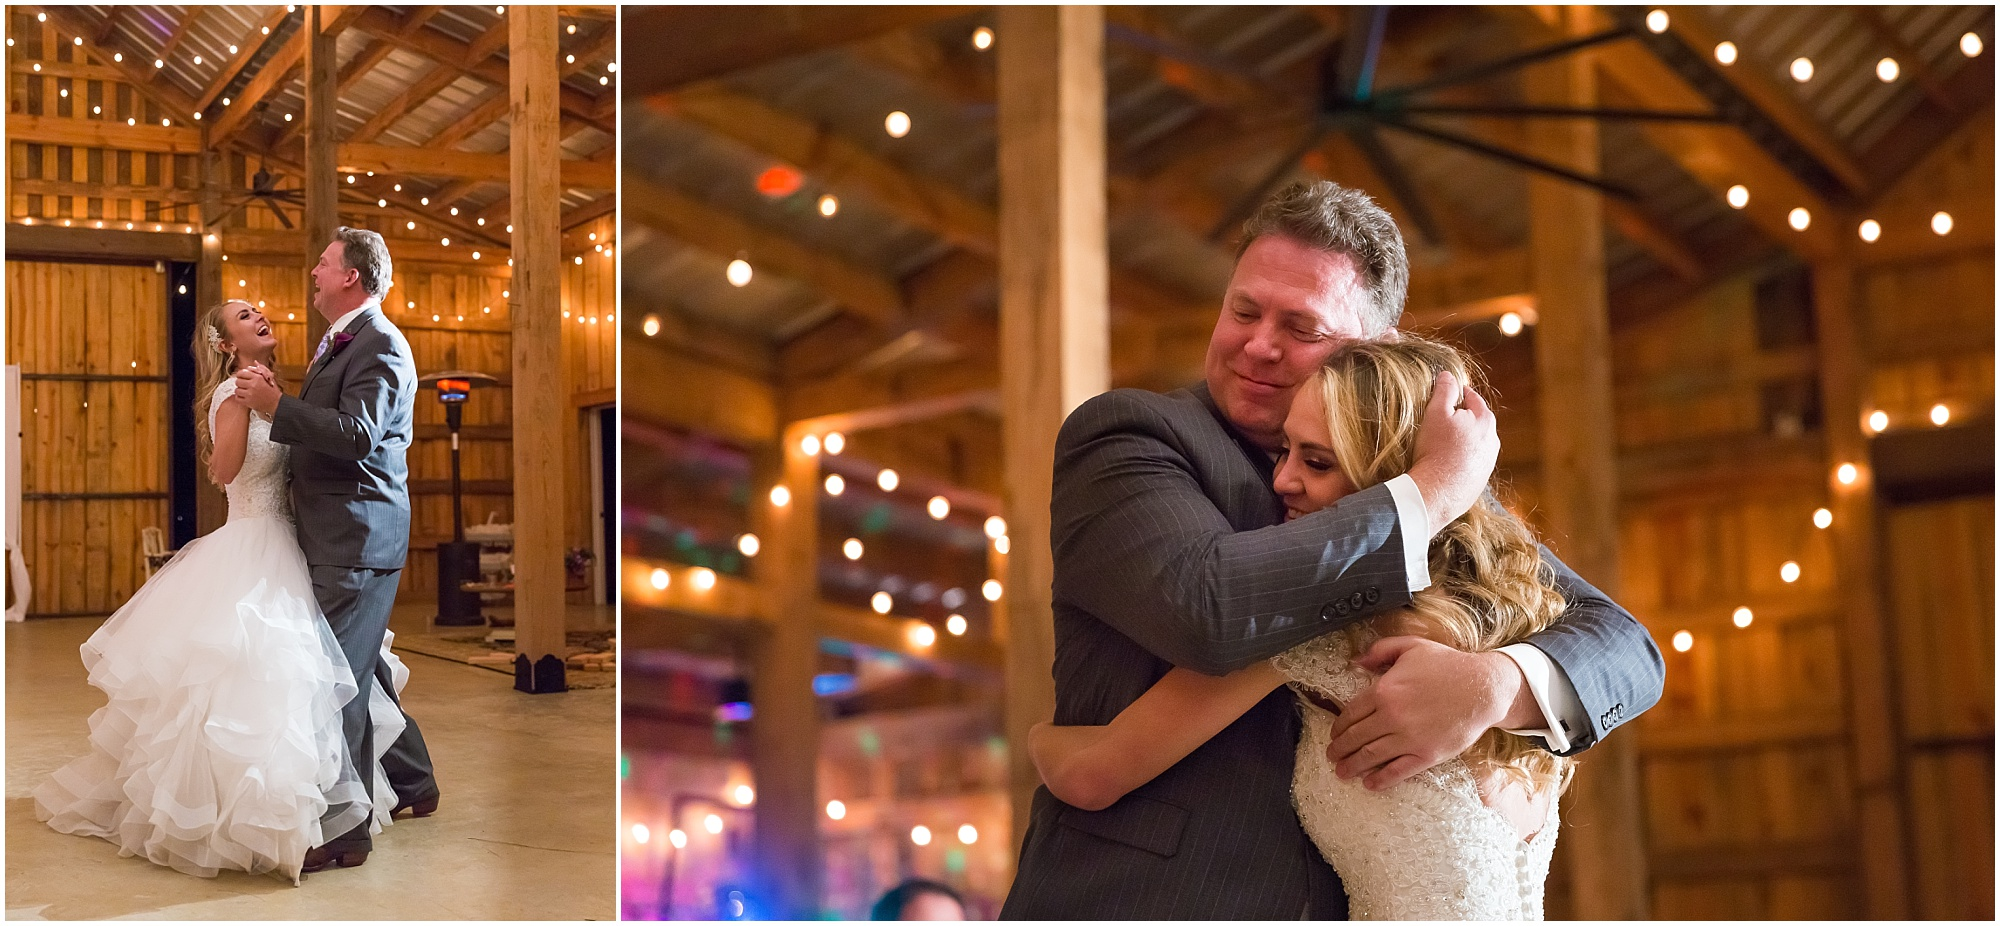 Disney-Inspired-Wedding-Central-Texas_0059.jpg